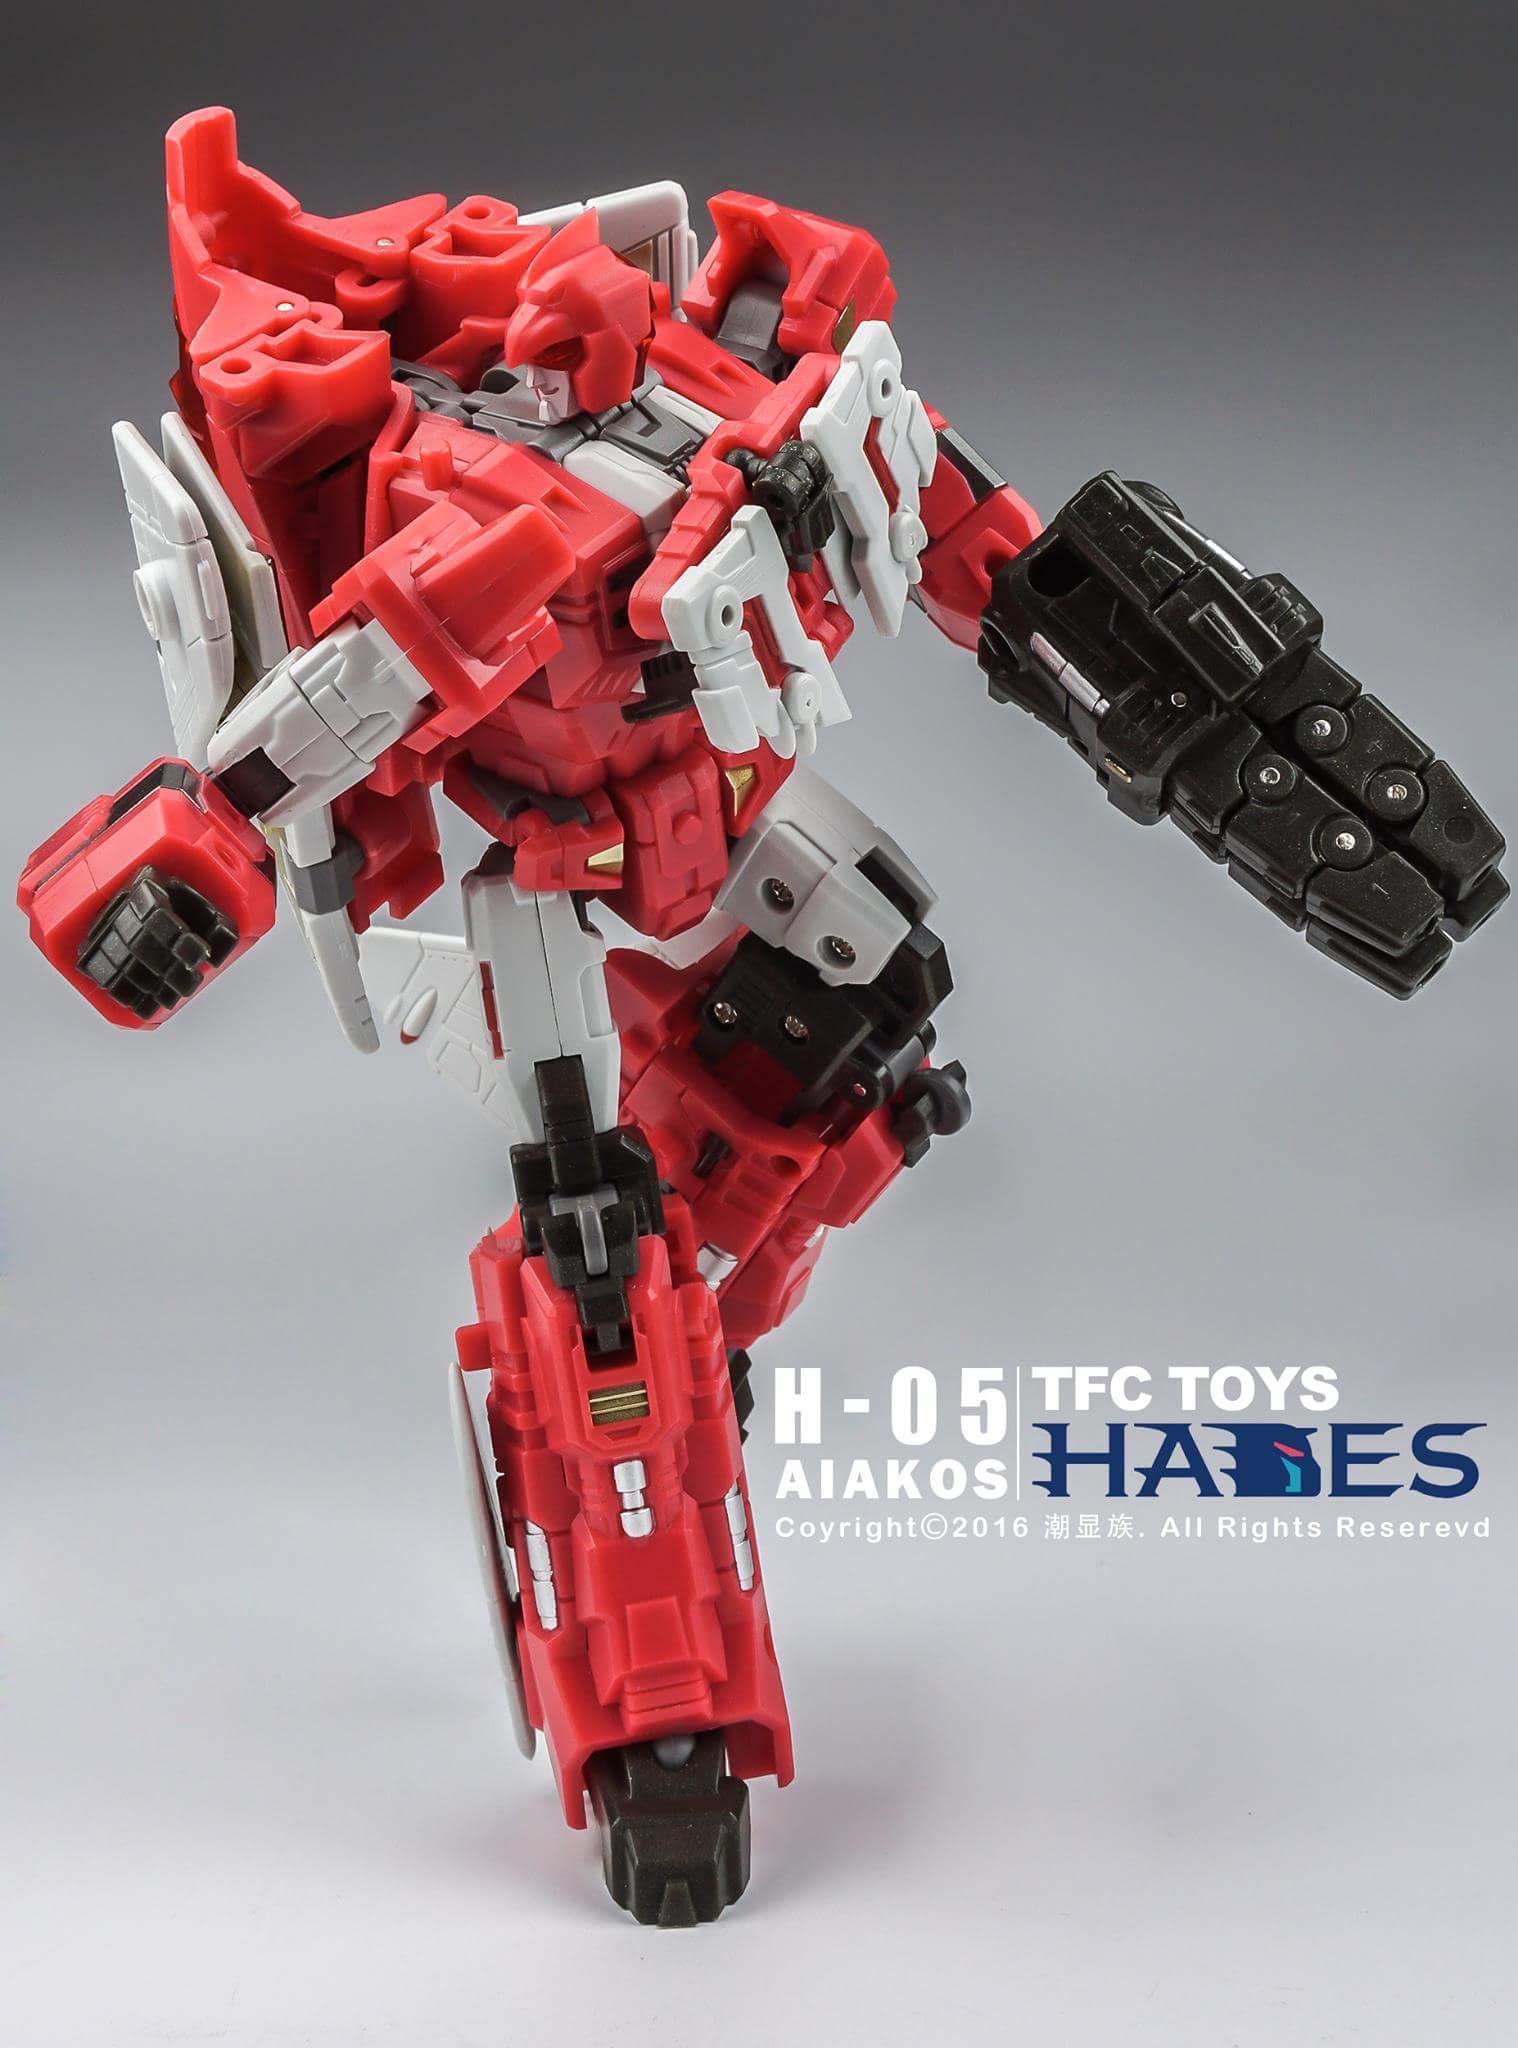 [TFC Toys] Produit Tiers - Jouet Hades - aka Liokaiser (Victory) - Page 4 MBqi20Hs